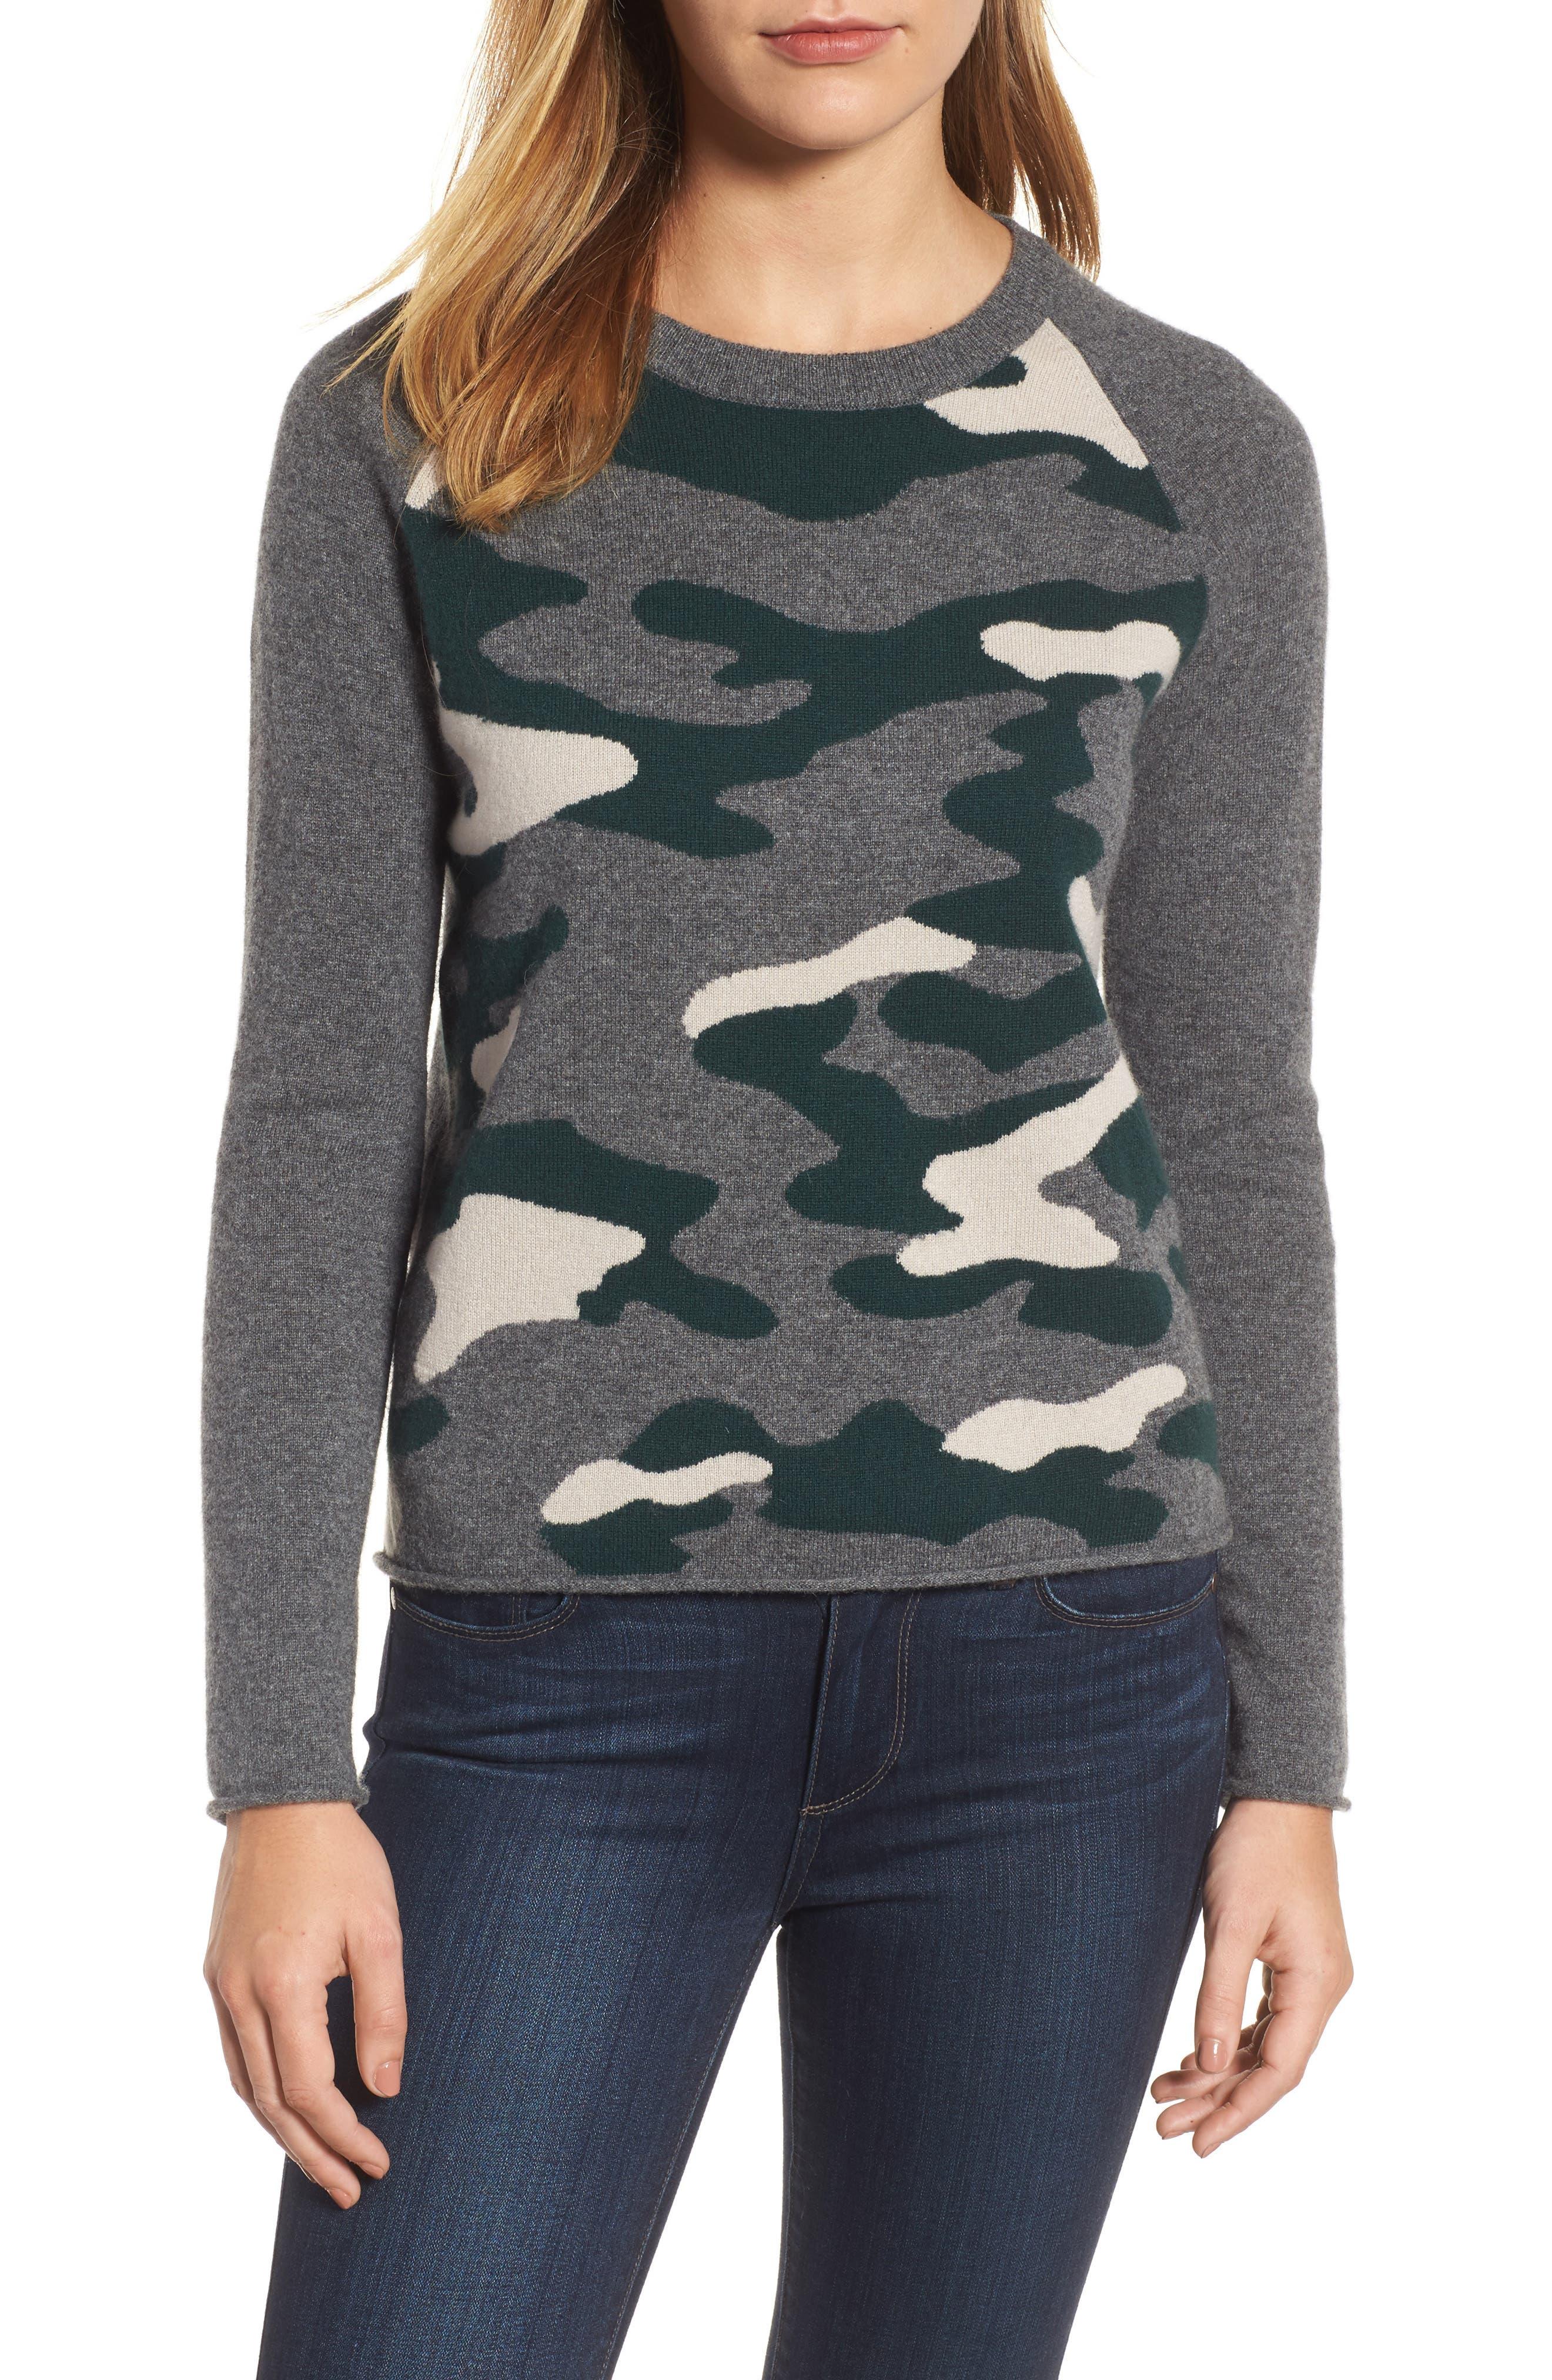 Camo Cashmere Sweater,                         Main,                         color, Multi